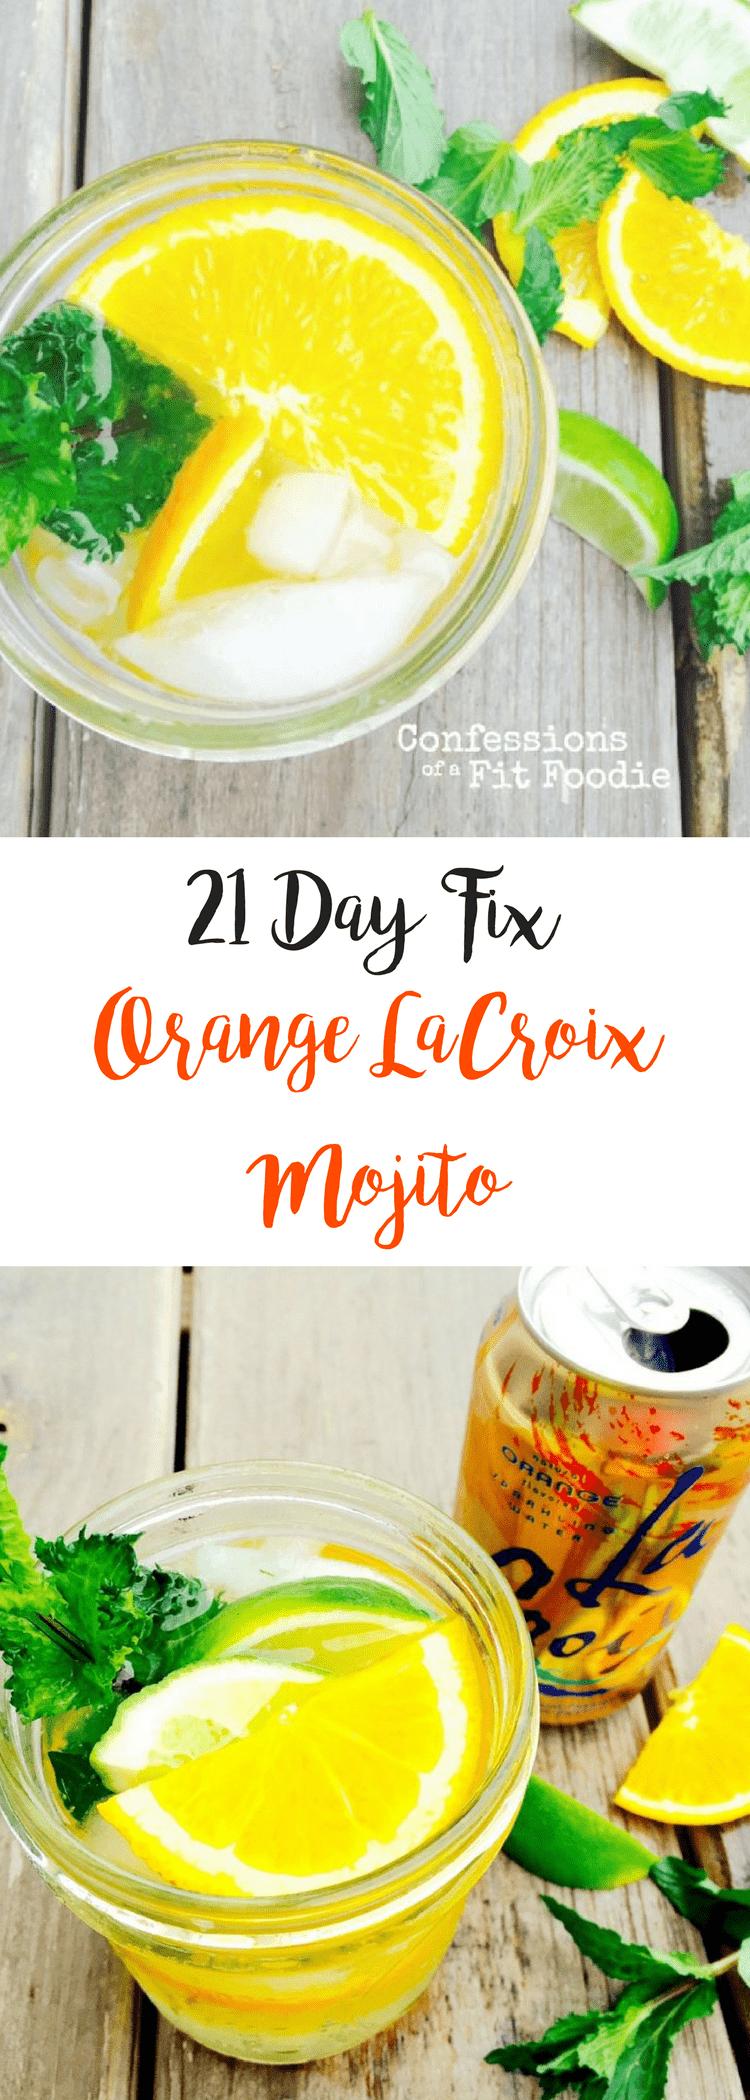 21 Day Fix Orange LaCroix Mojito | Confessions of a Fit Foodie